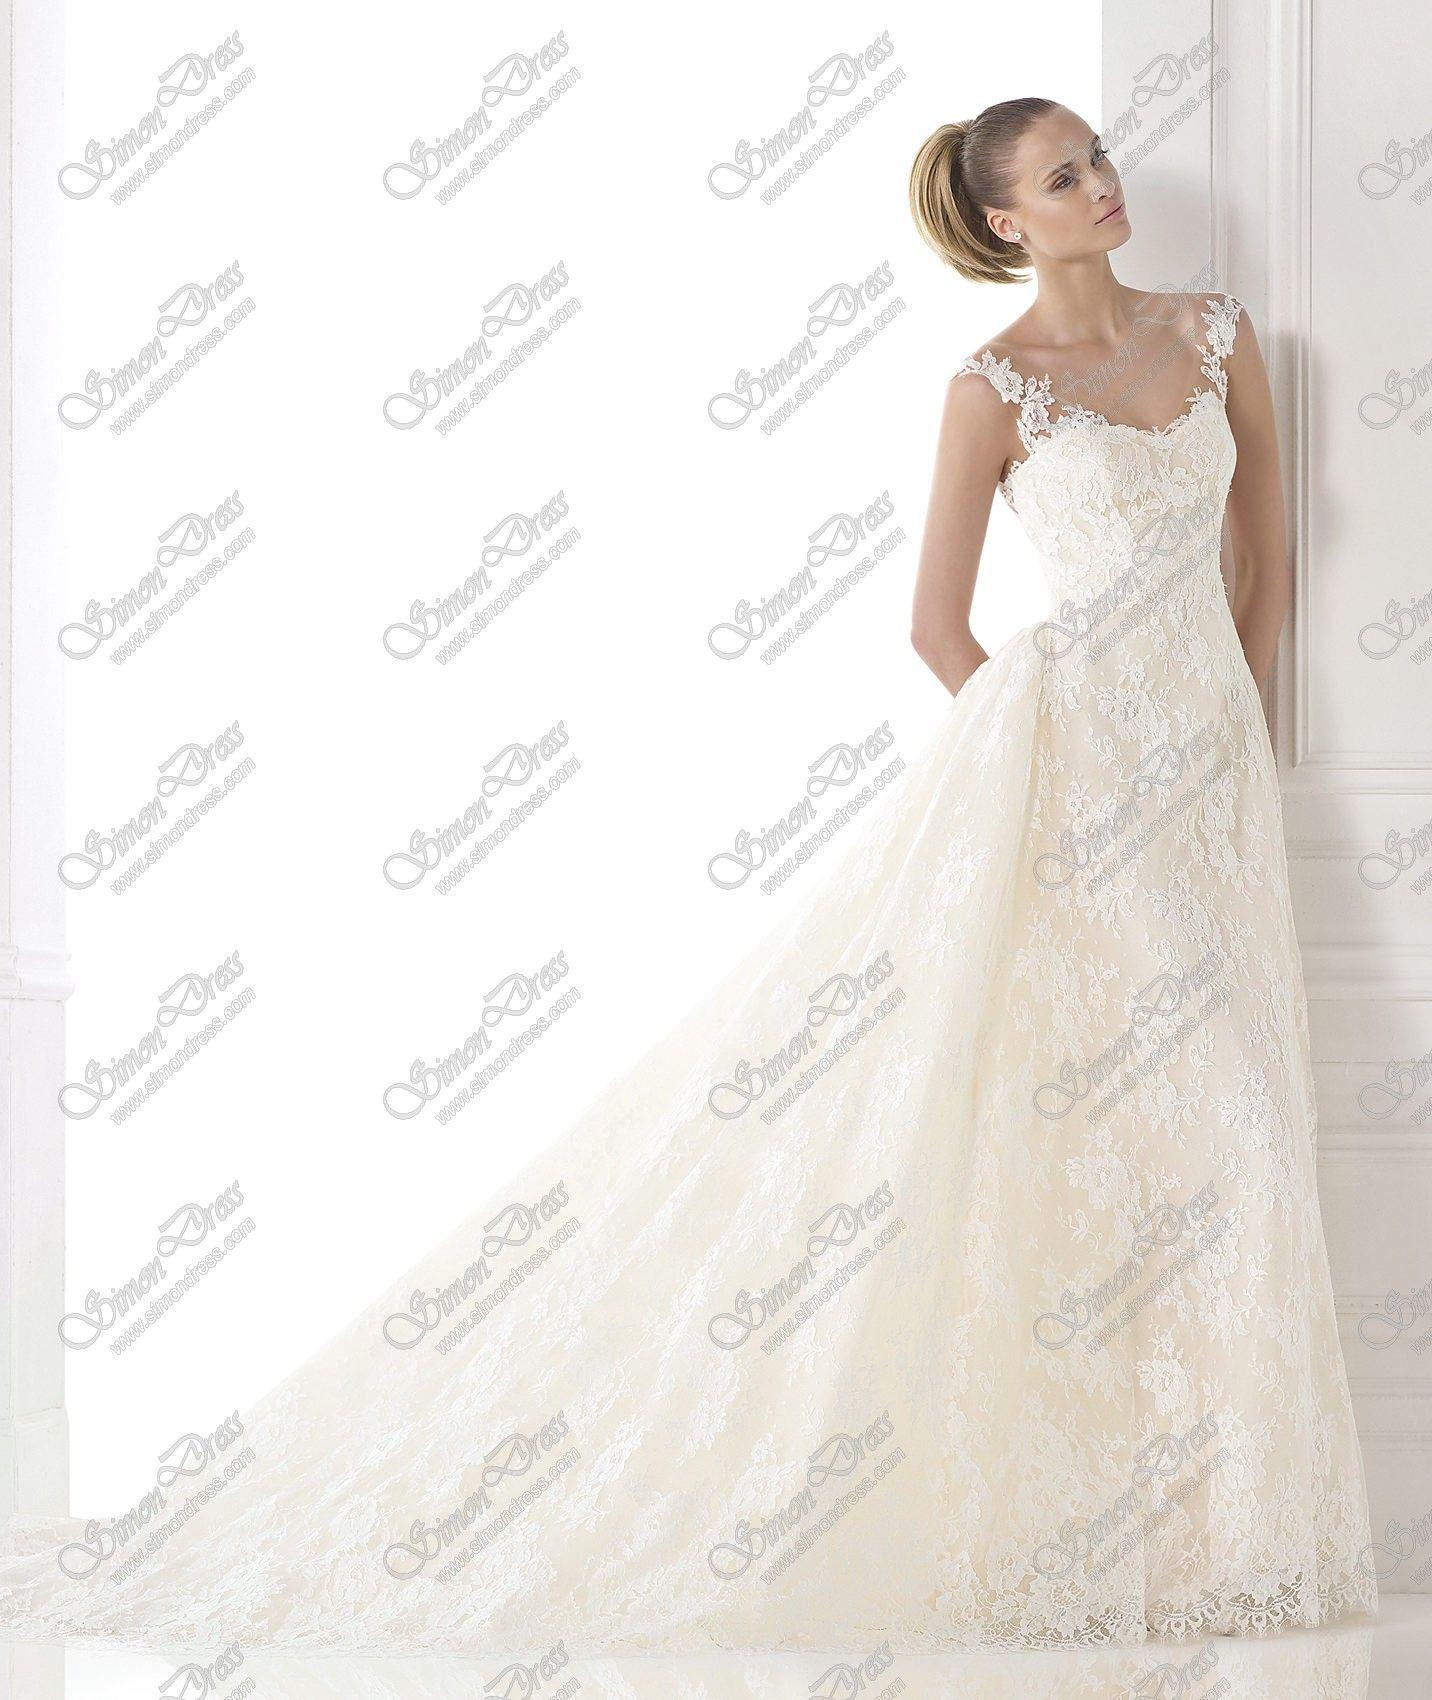 pronovias wedding dresses style constance pronovias wedding